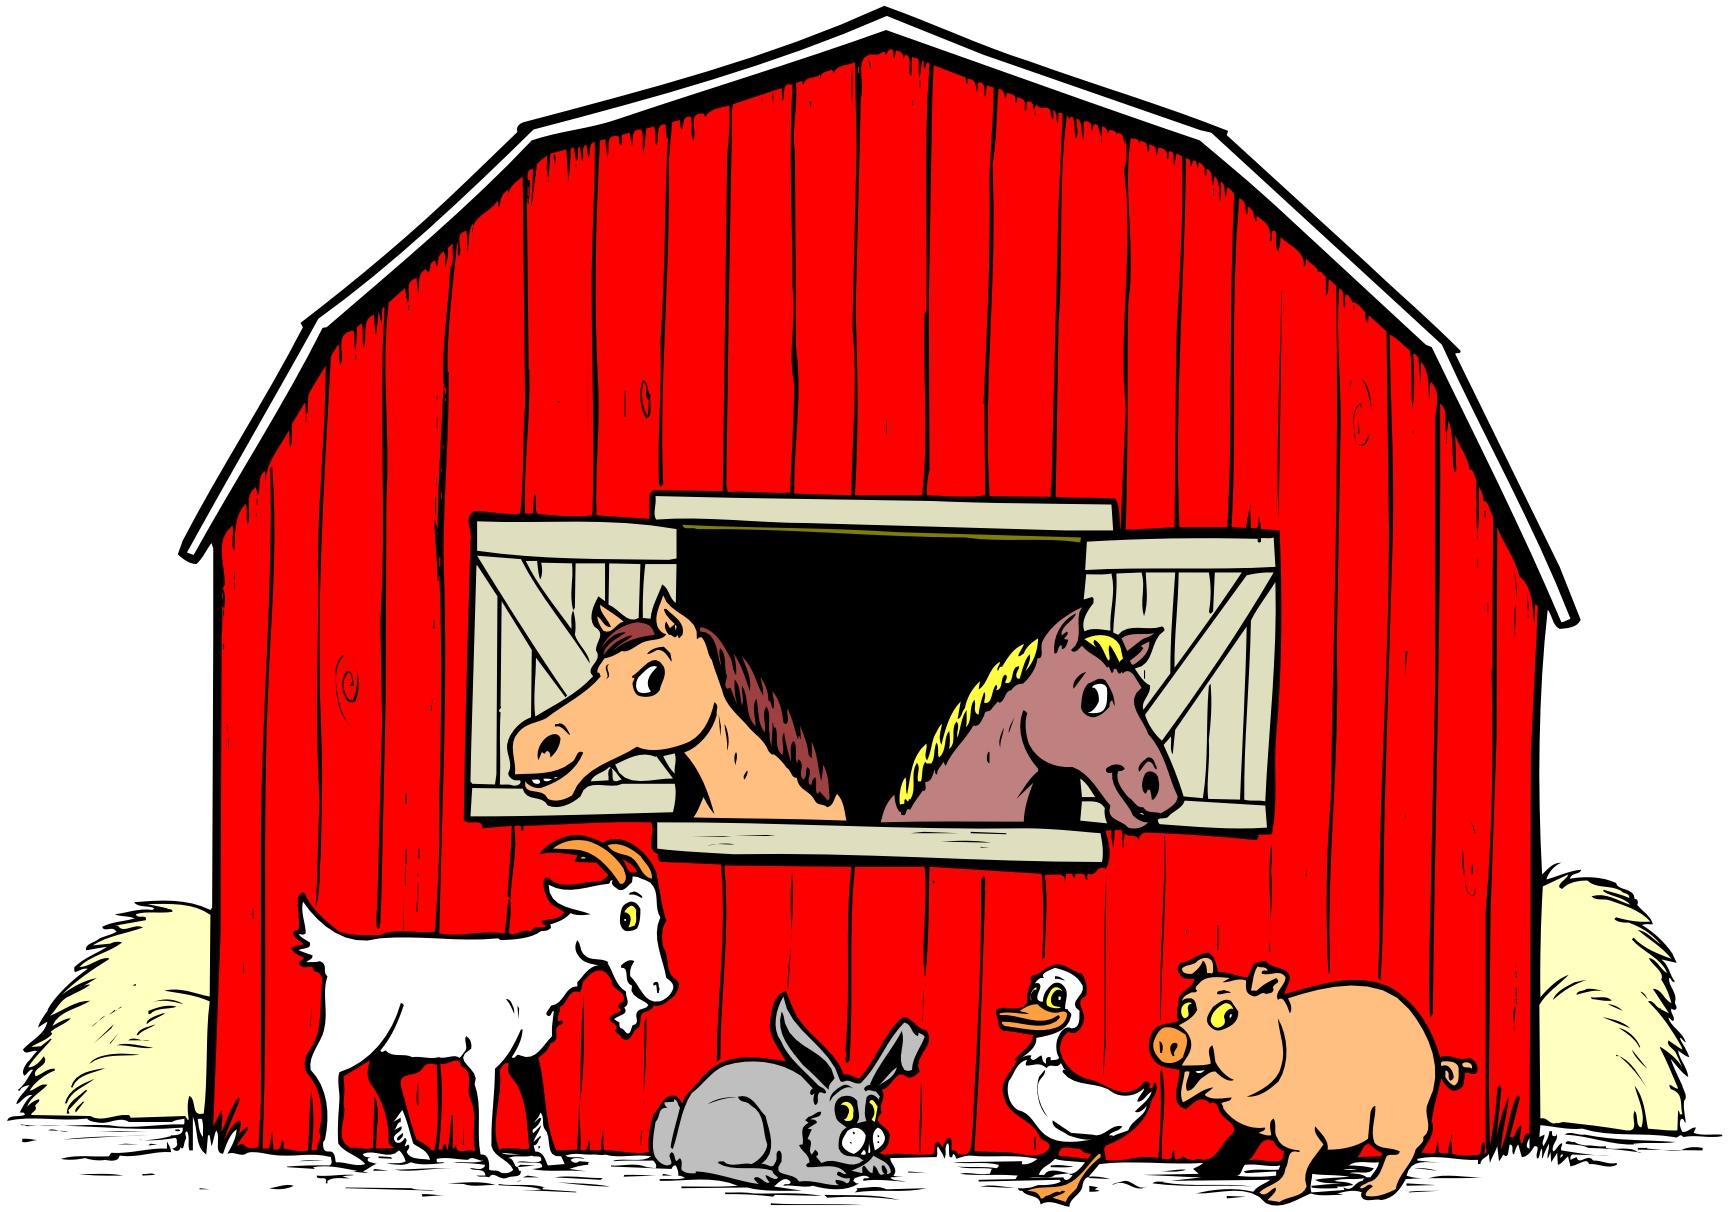 33   Großartig animal farm house for Animal Farm House Drawing  53kxo